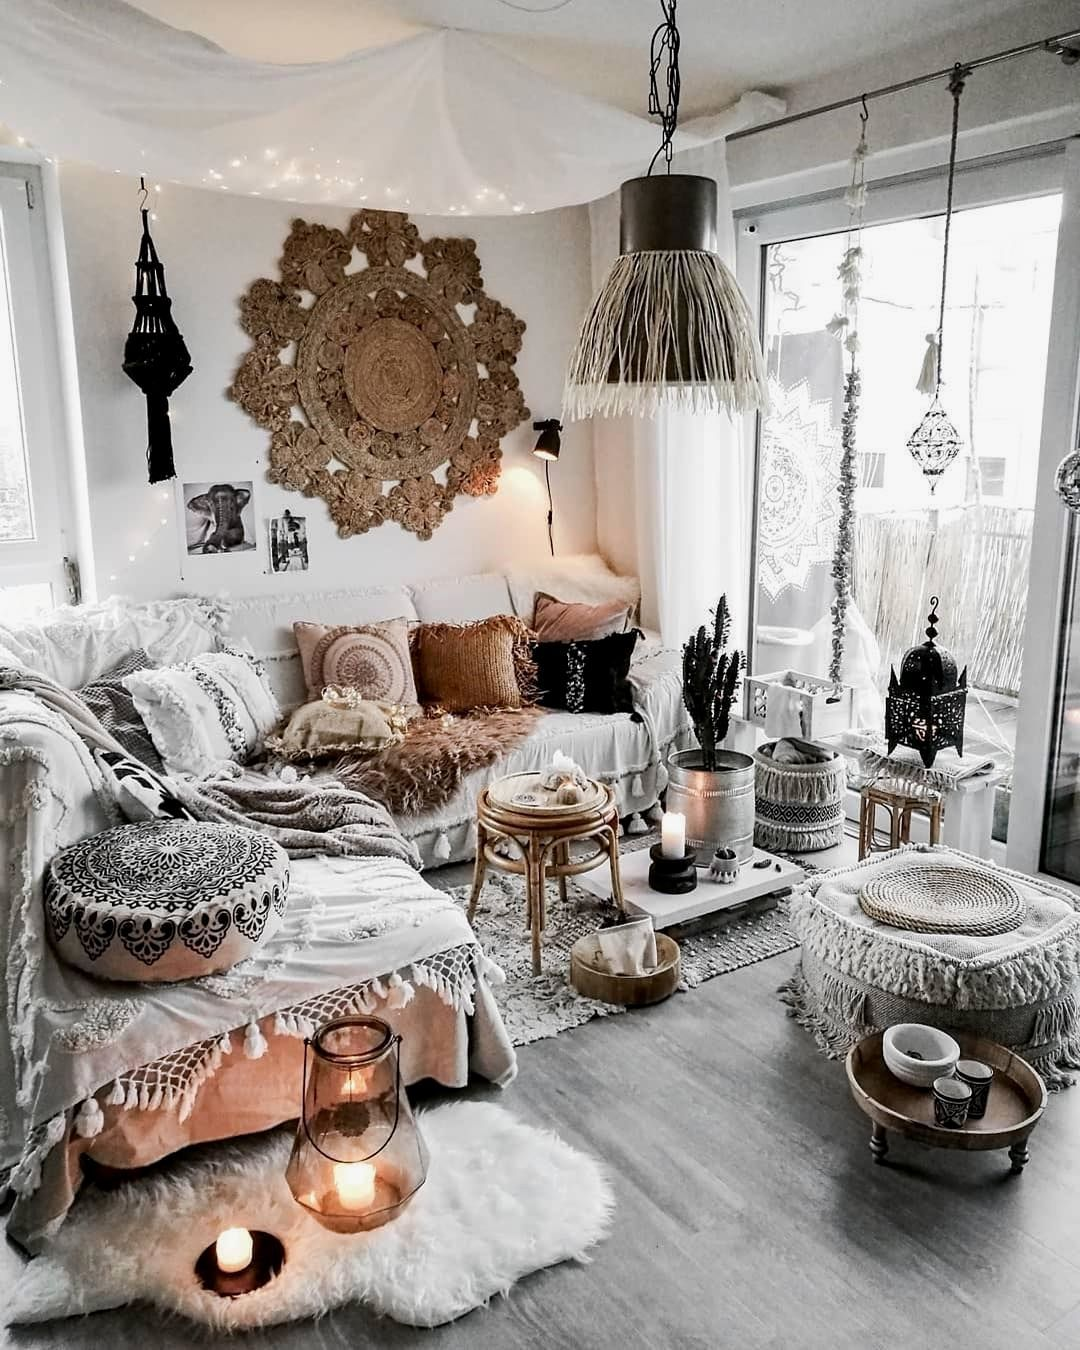 30 Beautiful Rustic Bohemian Living Room Design Ideas Rooms Home Decor Vintage Home Decor Interior Design